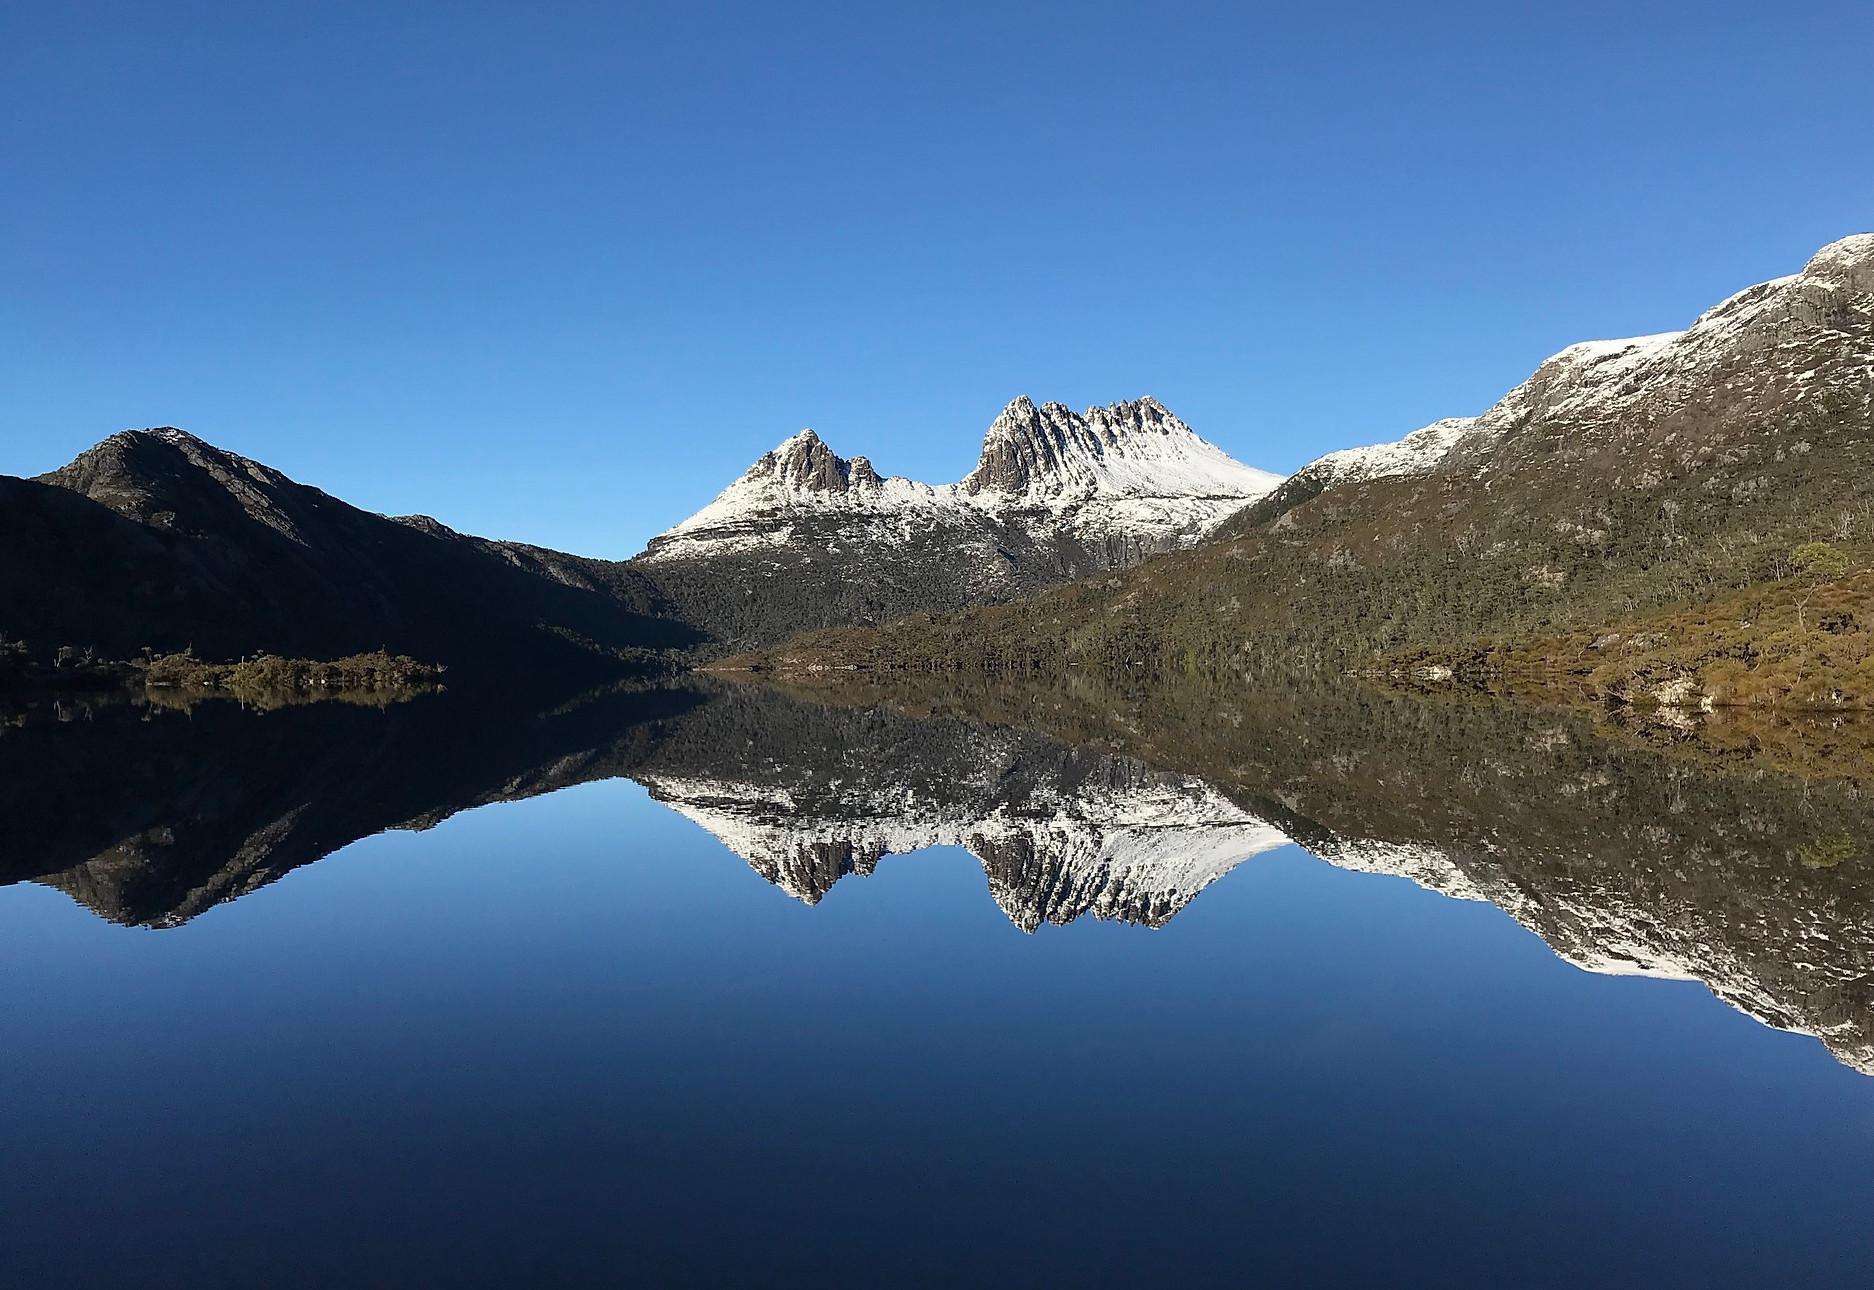 Озеро Дав, Крейдл Маунтин — Тасмания 2018 — Блог о путешествиях Сергея Чеботова